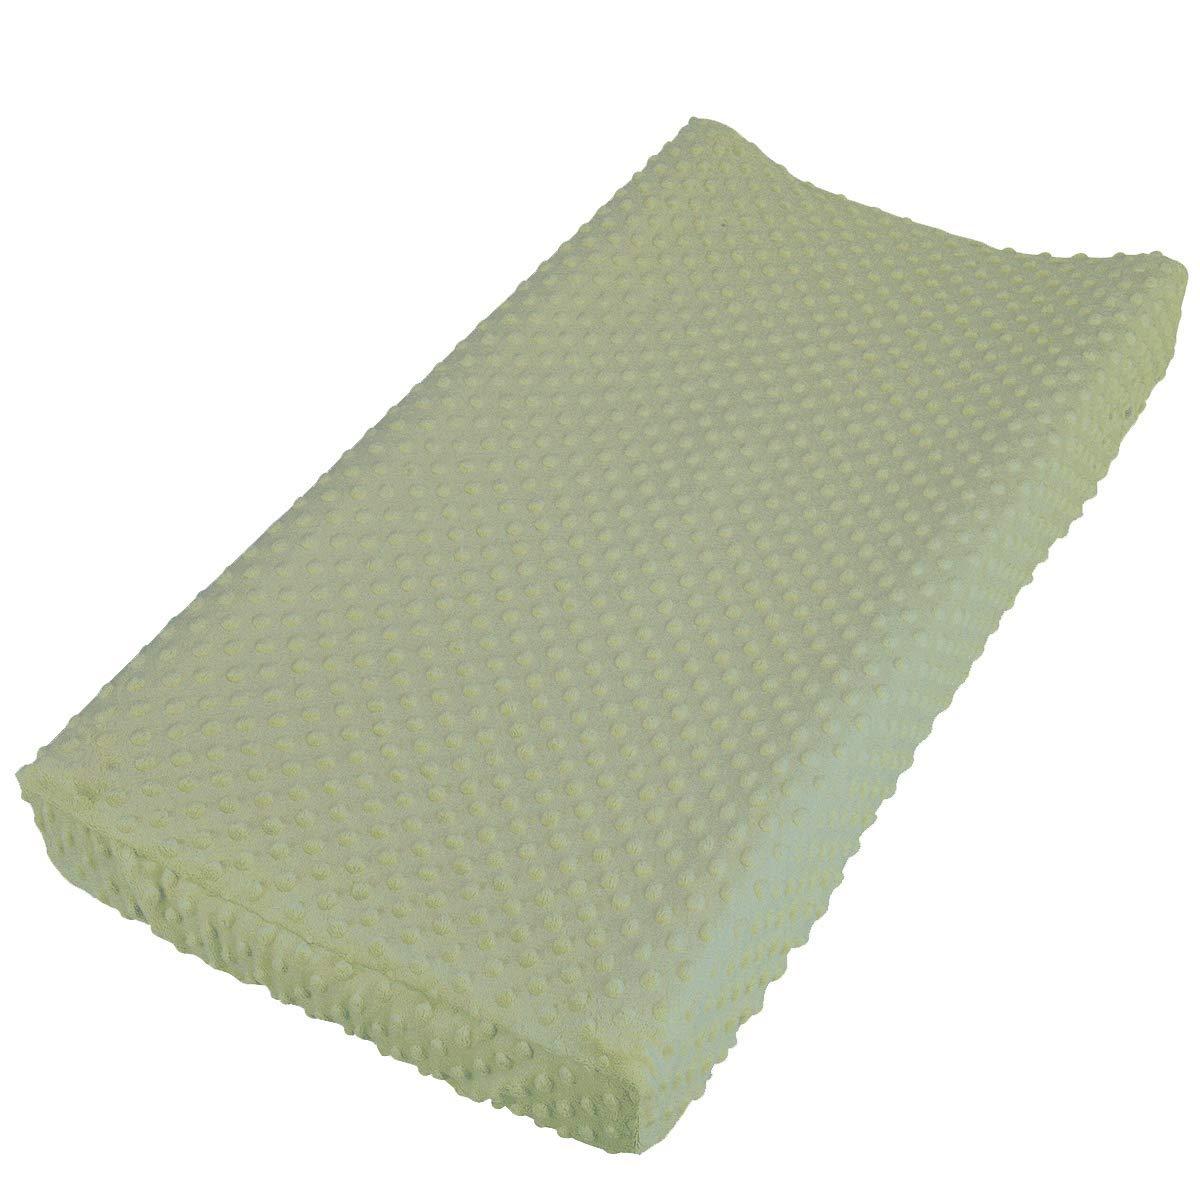 Nozaam Baby Minky Dot Changing Pad Cover Ultra Soft Changing Table Pad Cover for Diaper Changing Pad (Tidal Foam)